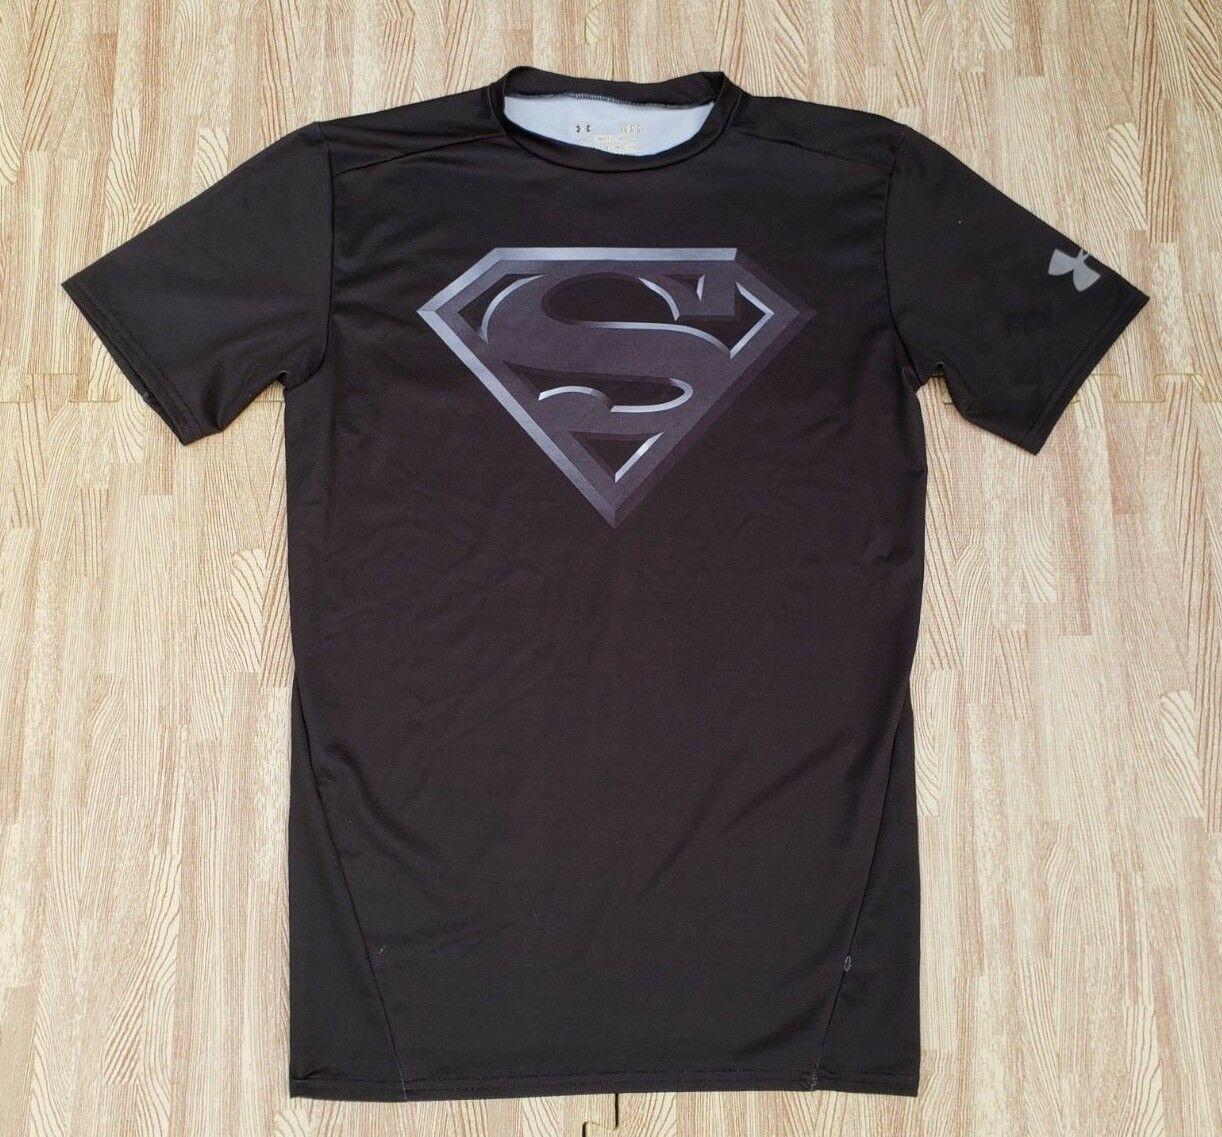 The North Face Men's Shirts & Tops MEN'S SURGENT HOODIE